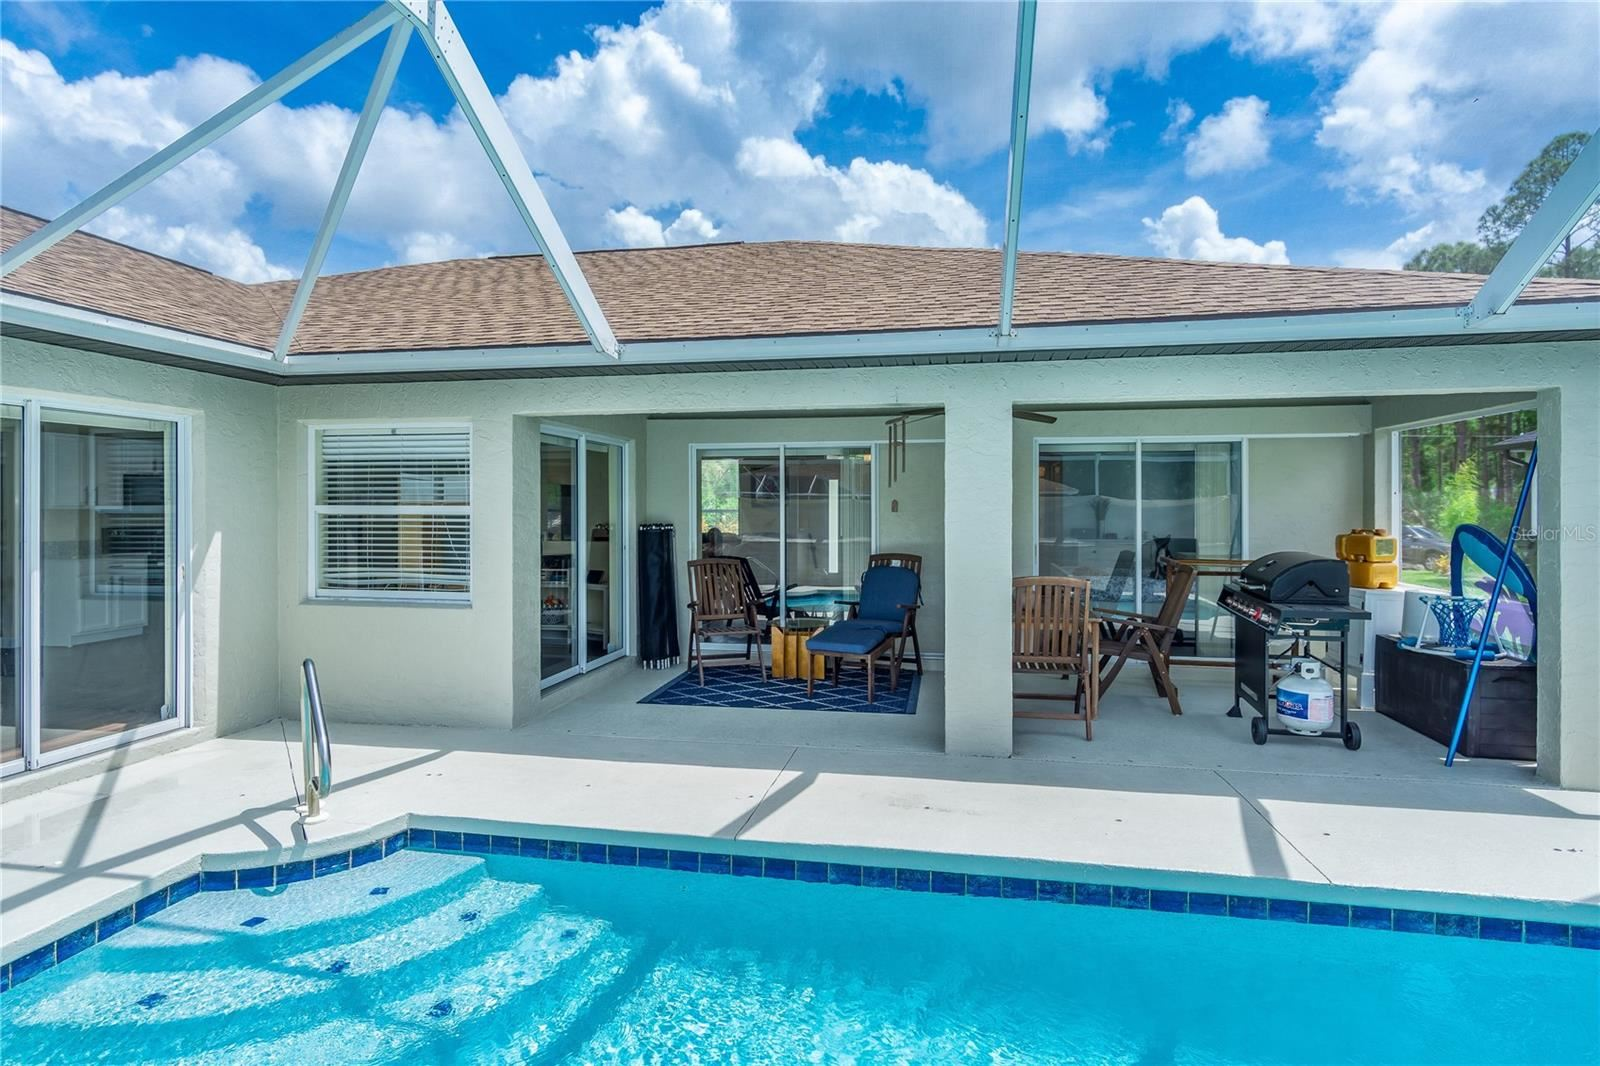 Photo of 4038 CORYDON AVENUE, NORTH PORT, FL 34286 (MLS # N6116002)